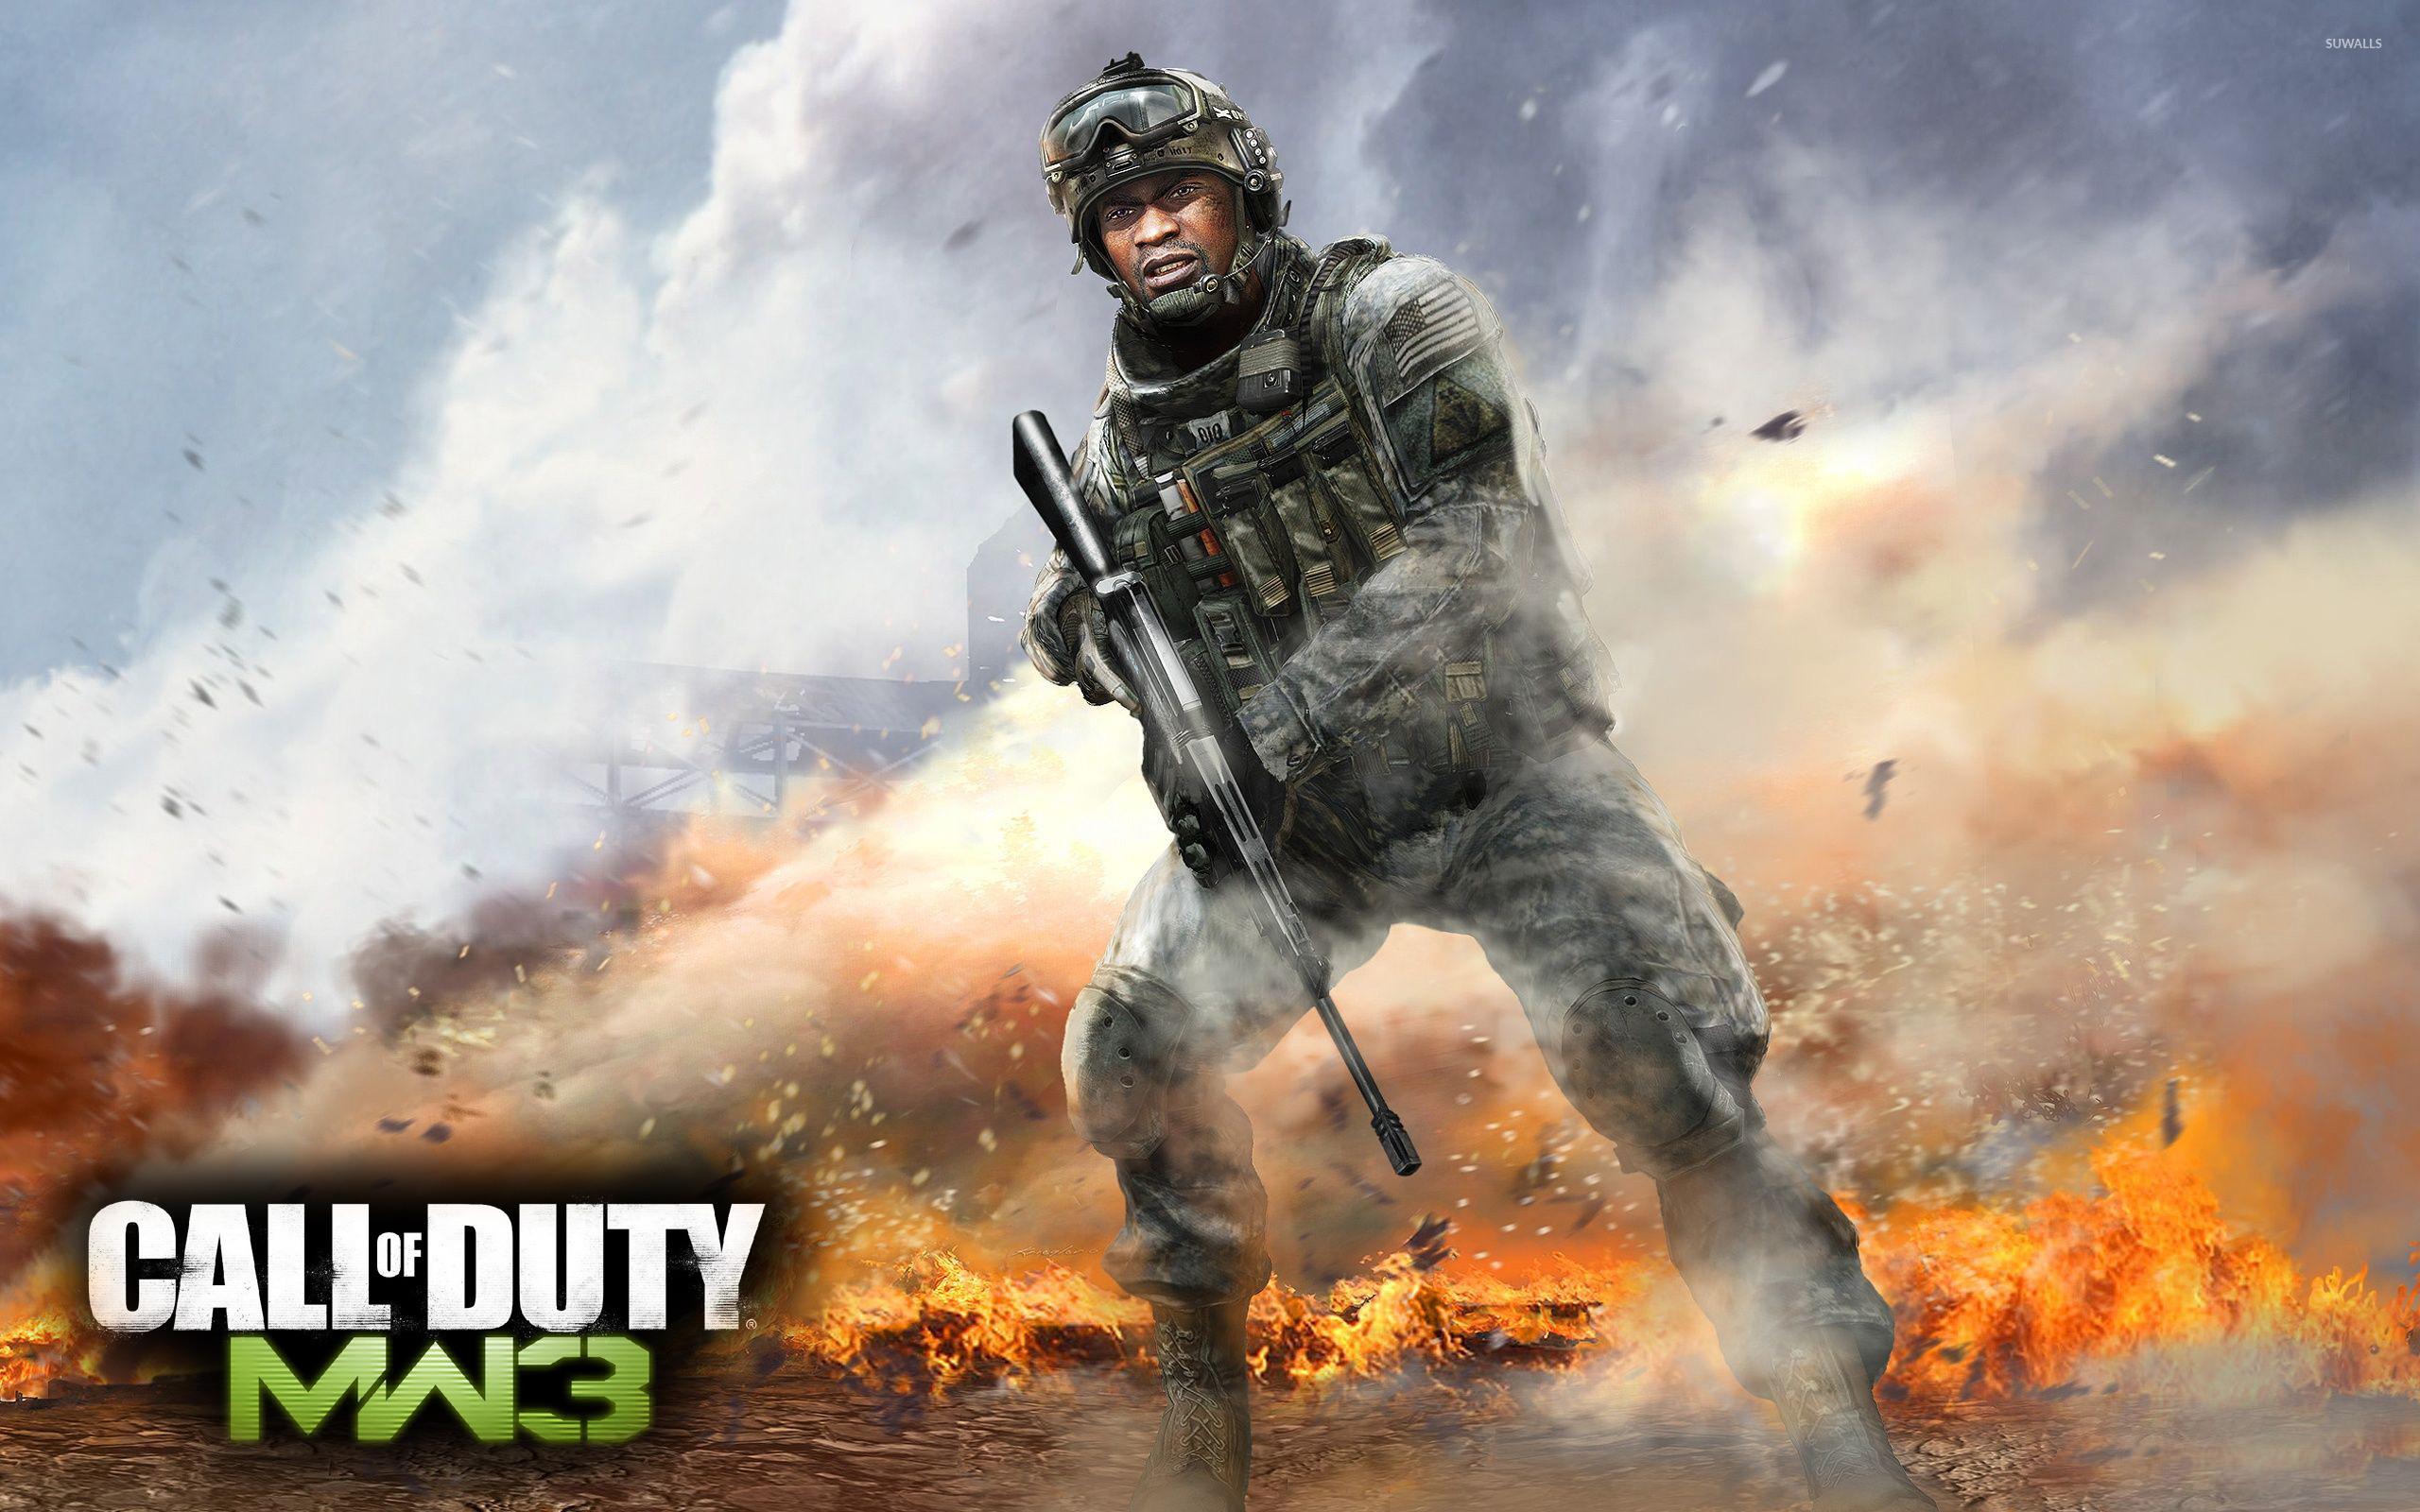 Call Of Duty Modern Warfare 3 5 Wallpaper Game Wallpapers